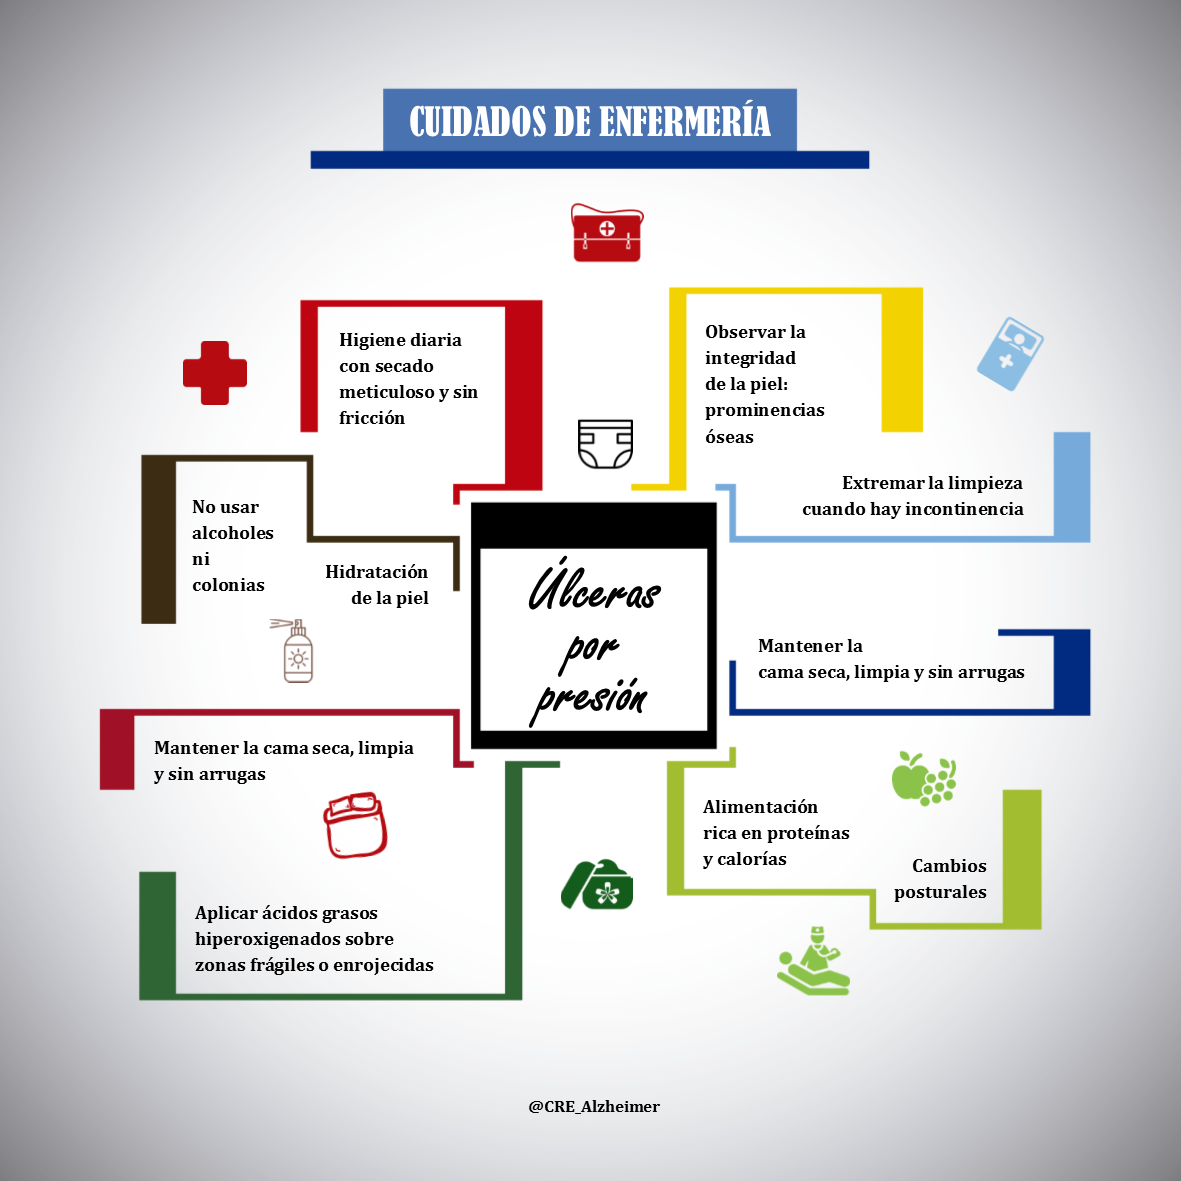 22 Ideas De Ulceras X Presion Enfermeria Auxiliar De Enfermeria Cuidados De Enfermería